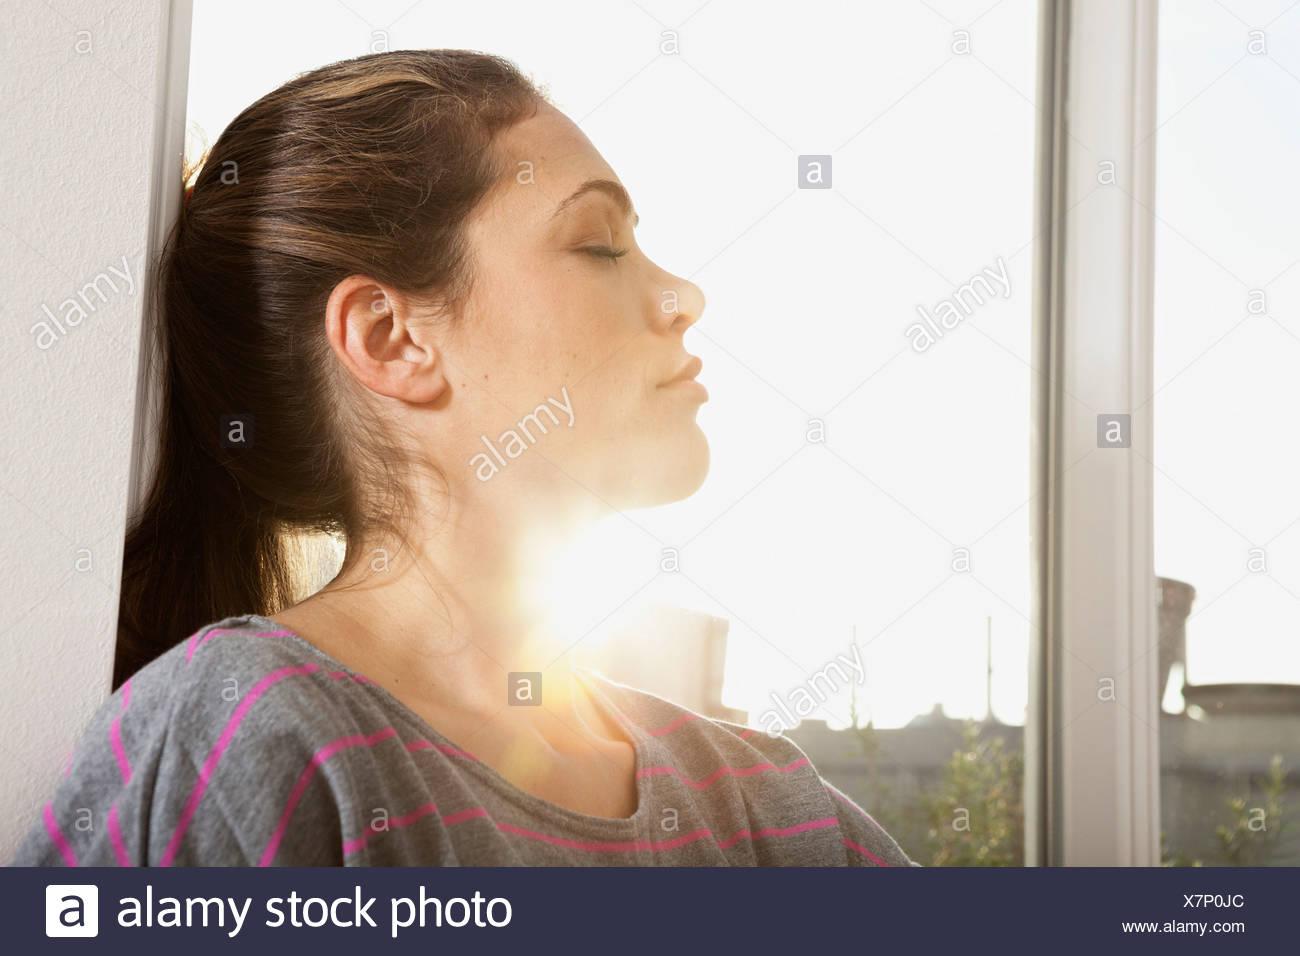 Porträt der Frau stehen am offenen Fenster Stockbild